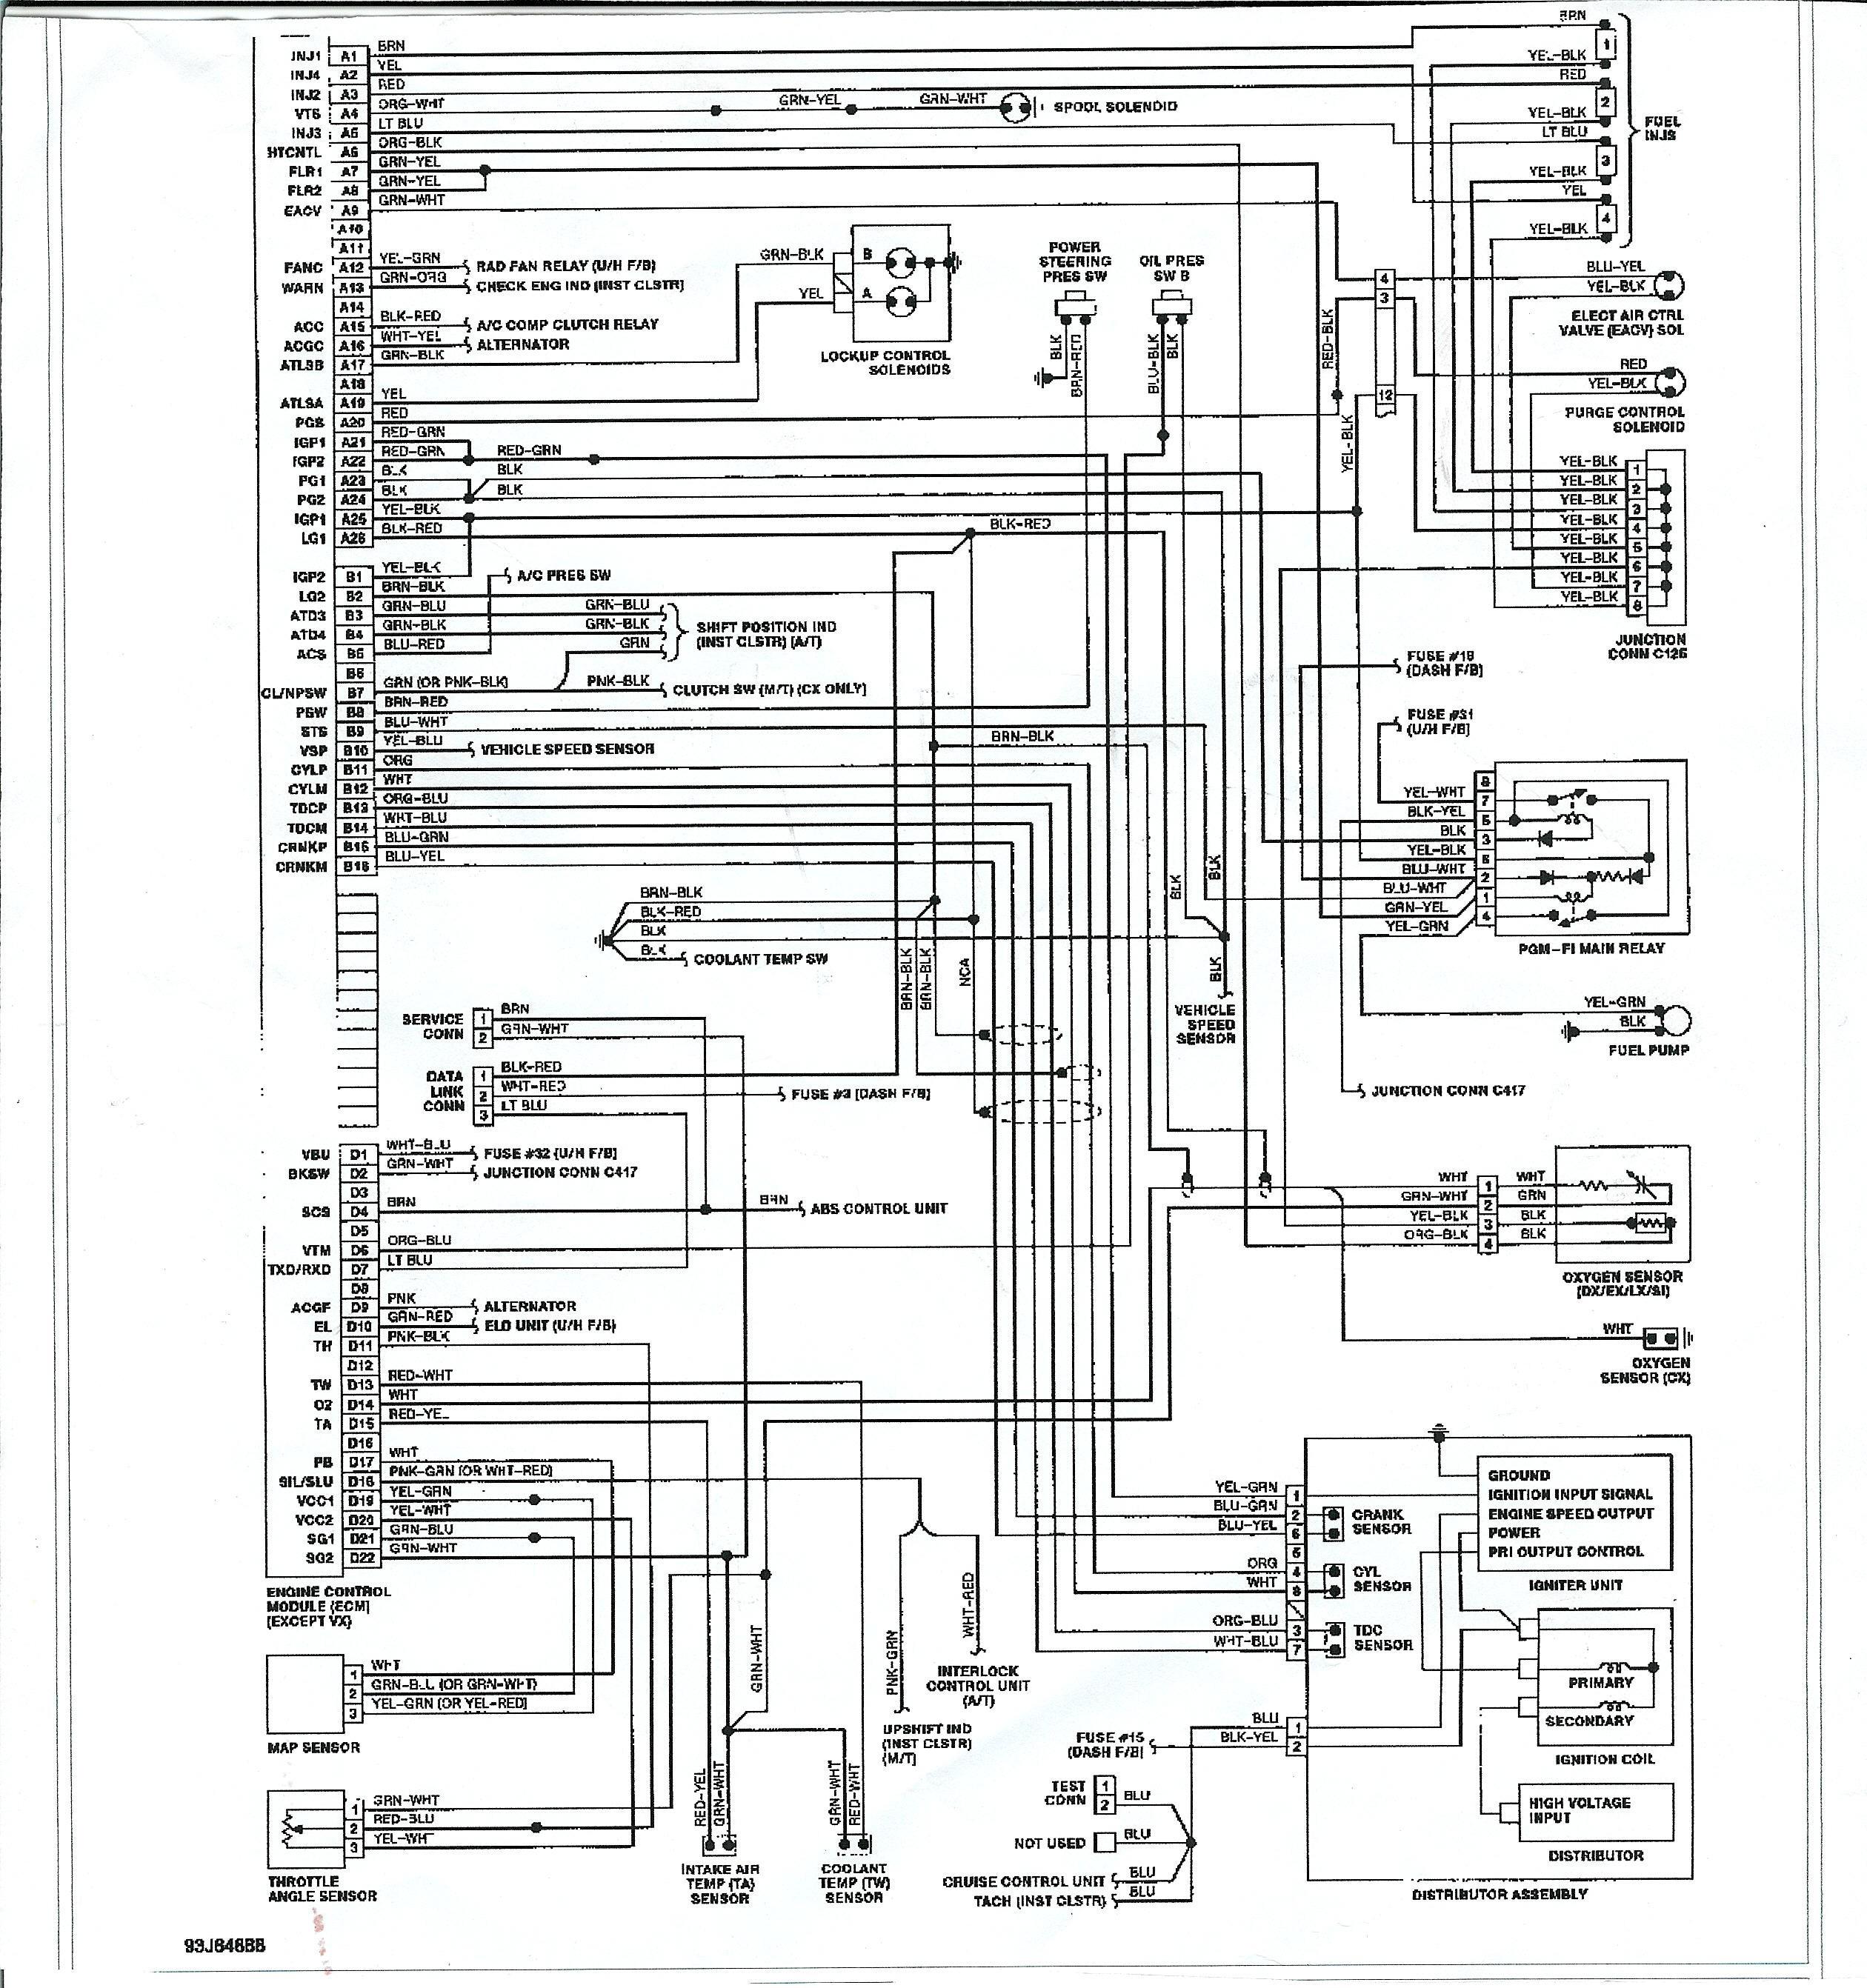 95 Honda Accord Engine Diagram Honda Accord 1994 Engine Diagram Vw Transporter Wiring Diagram 95 Of 95 Honda Accord Engine Diagram